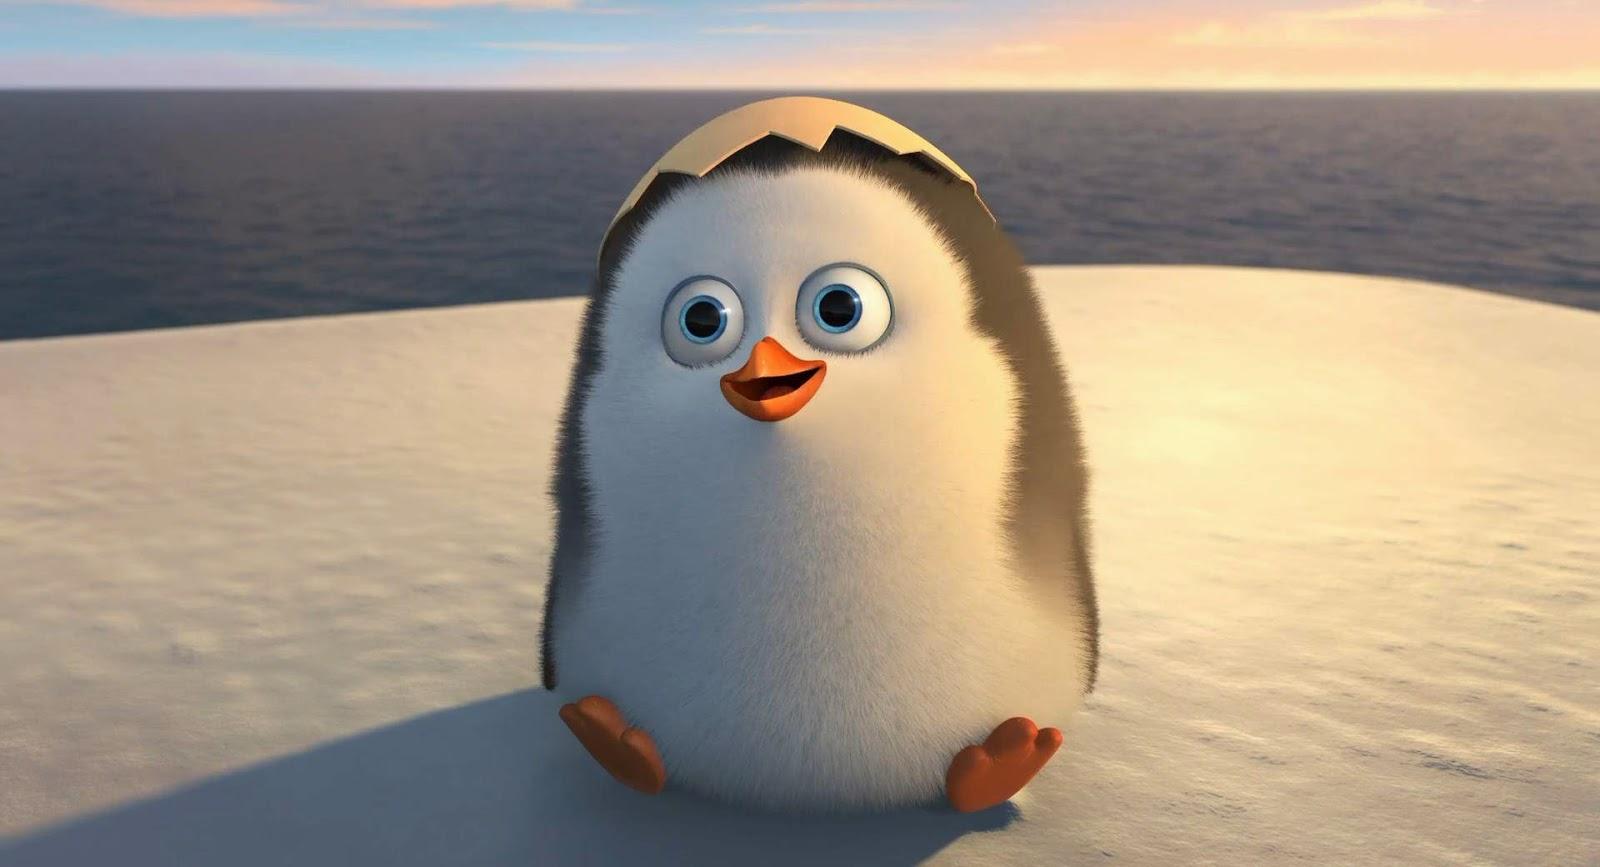 Penguins of Madagascar (2014) 1080p 1080p S3 s Penguins of Madagascar (2014) 1080p 1080p